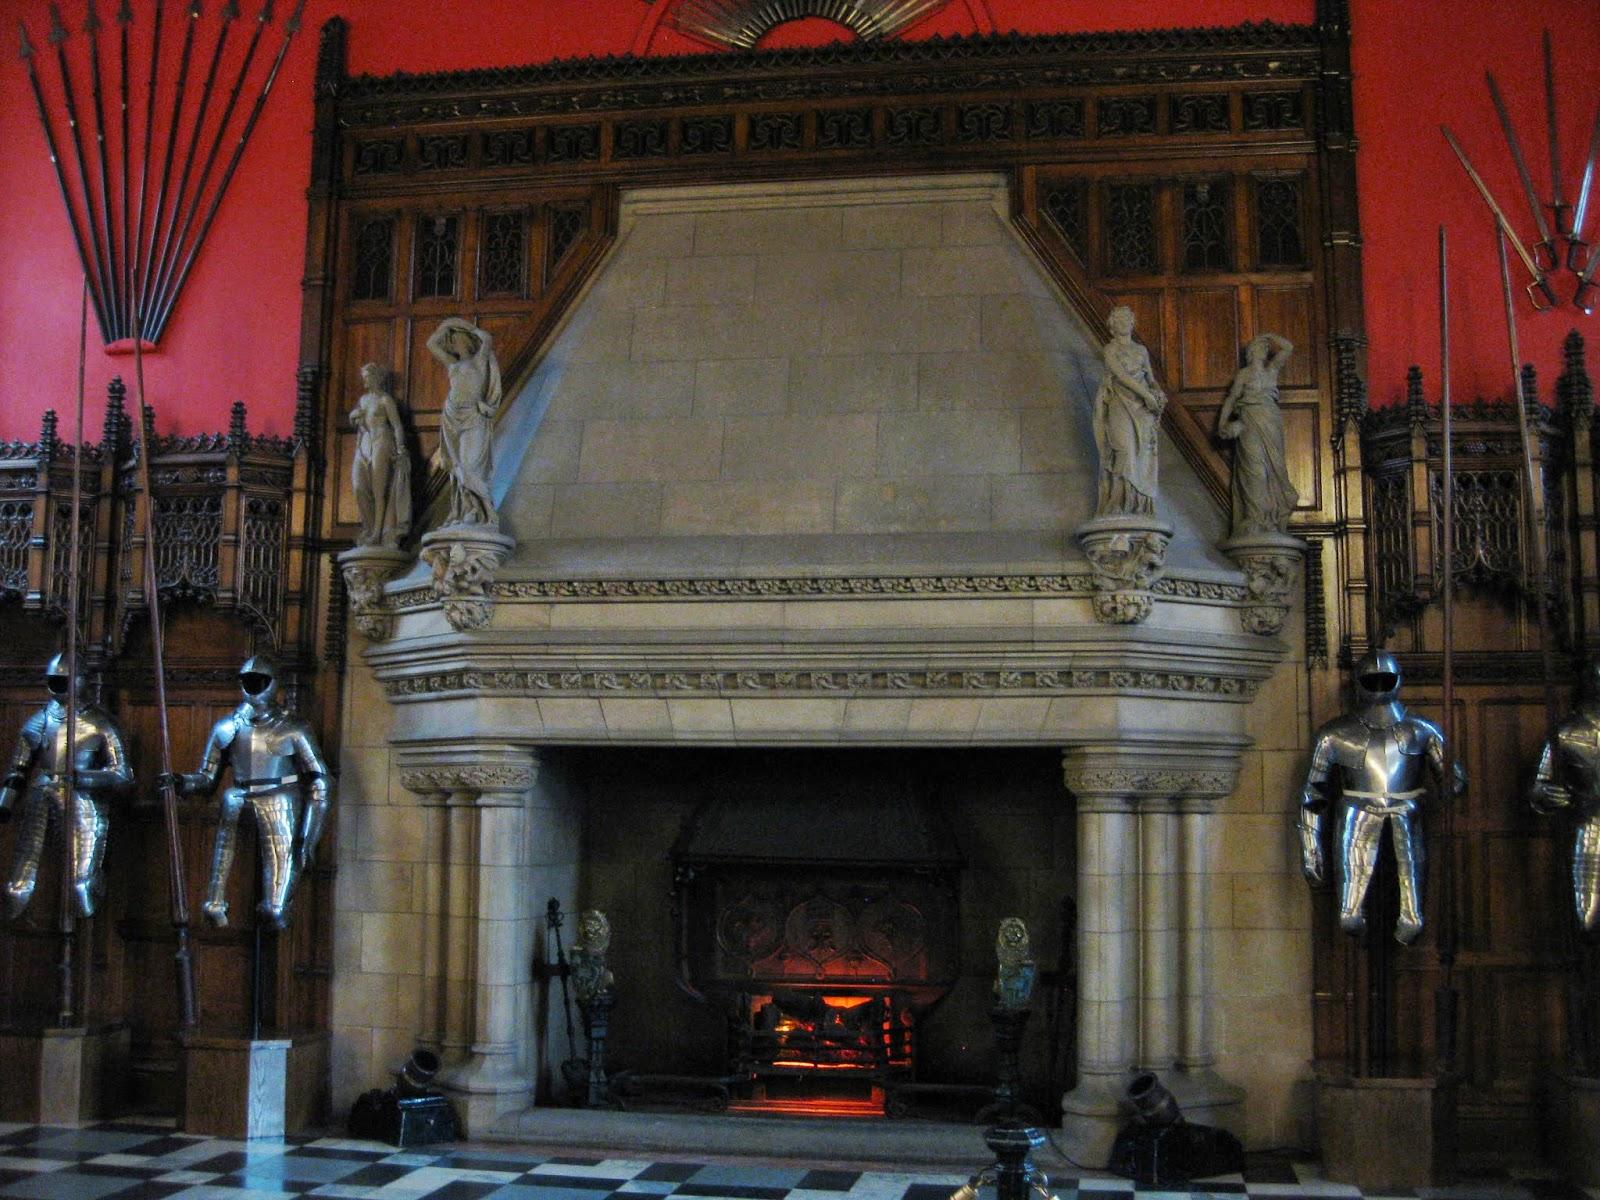 jen u0026 angel in europe edinburgh day 2 edinburgh castle